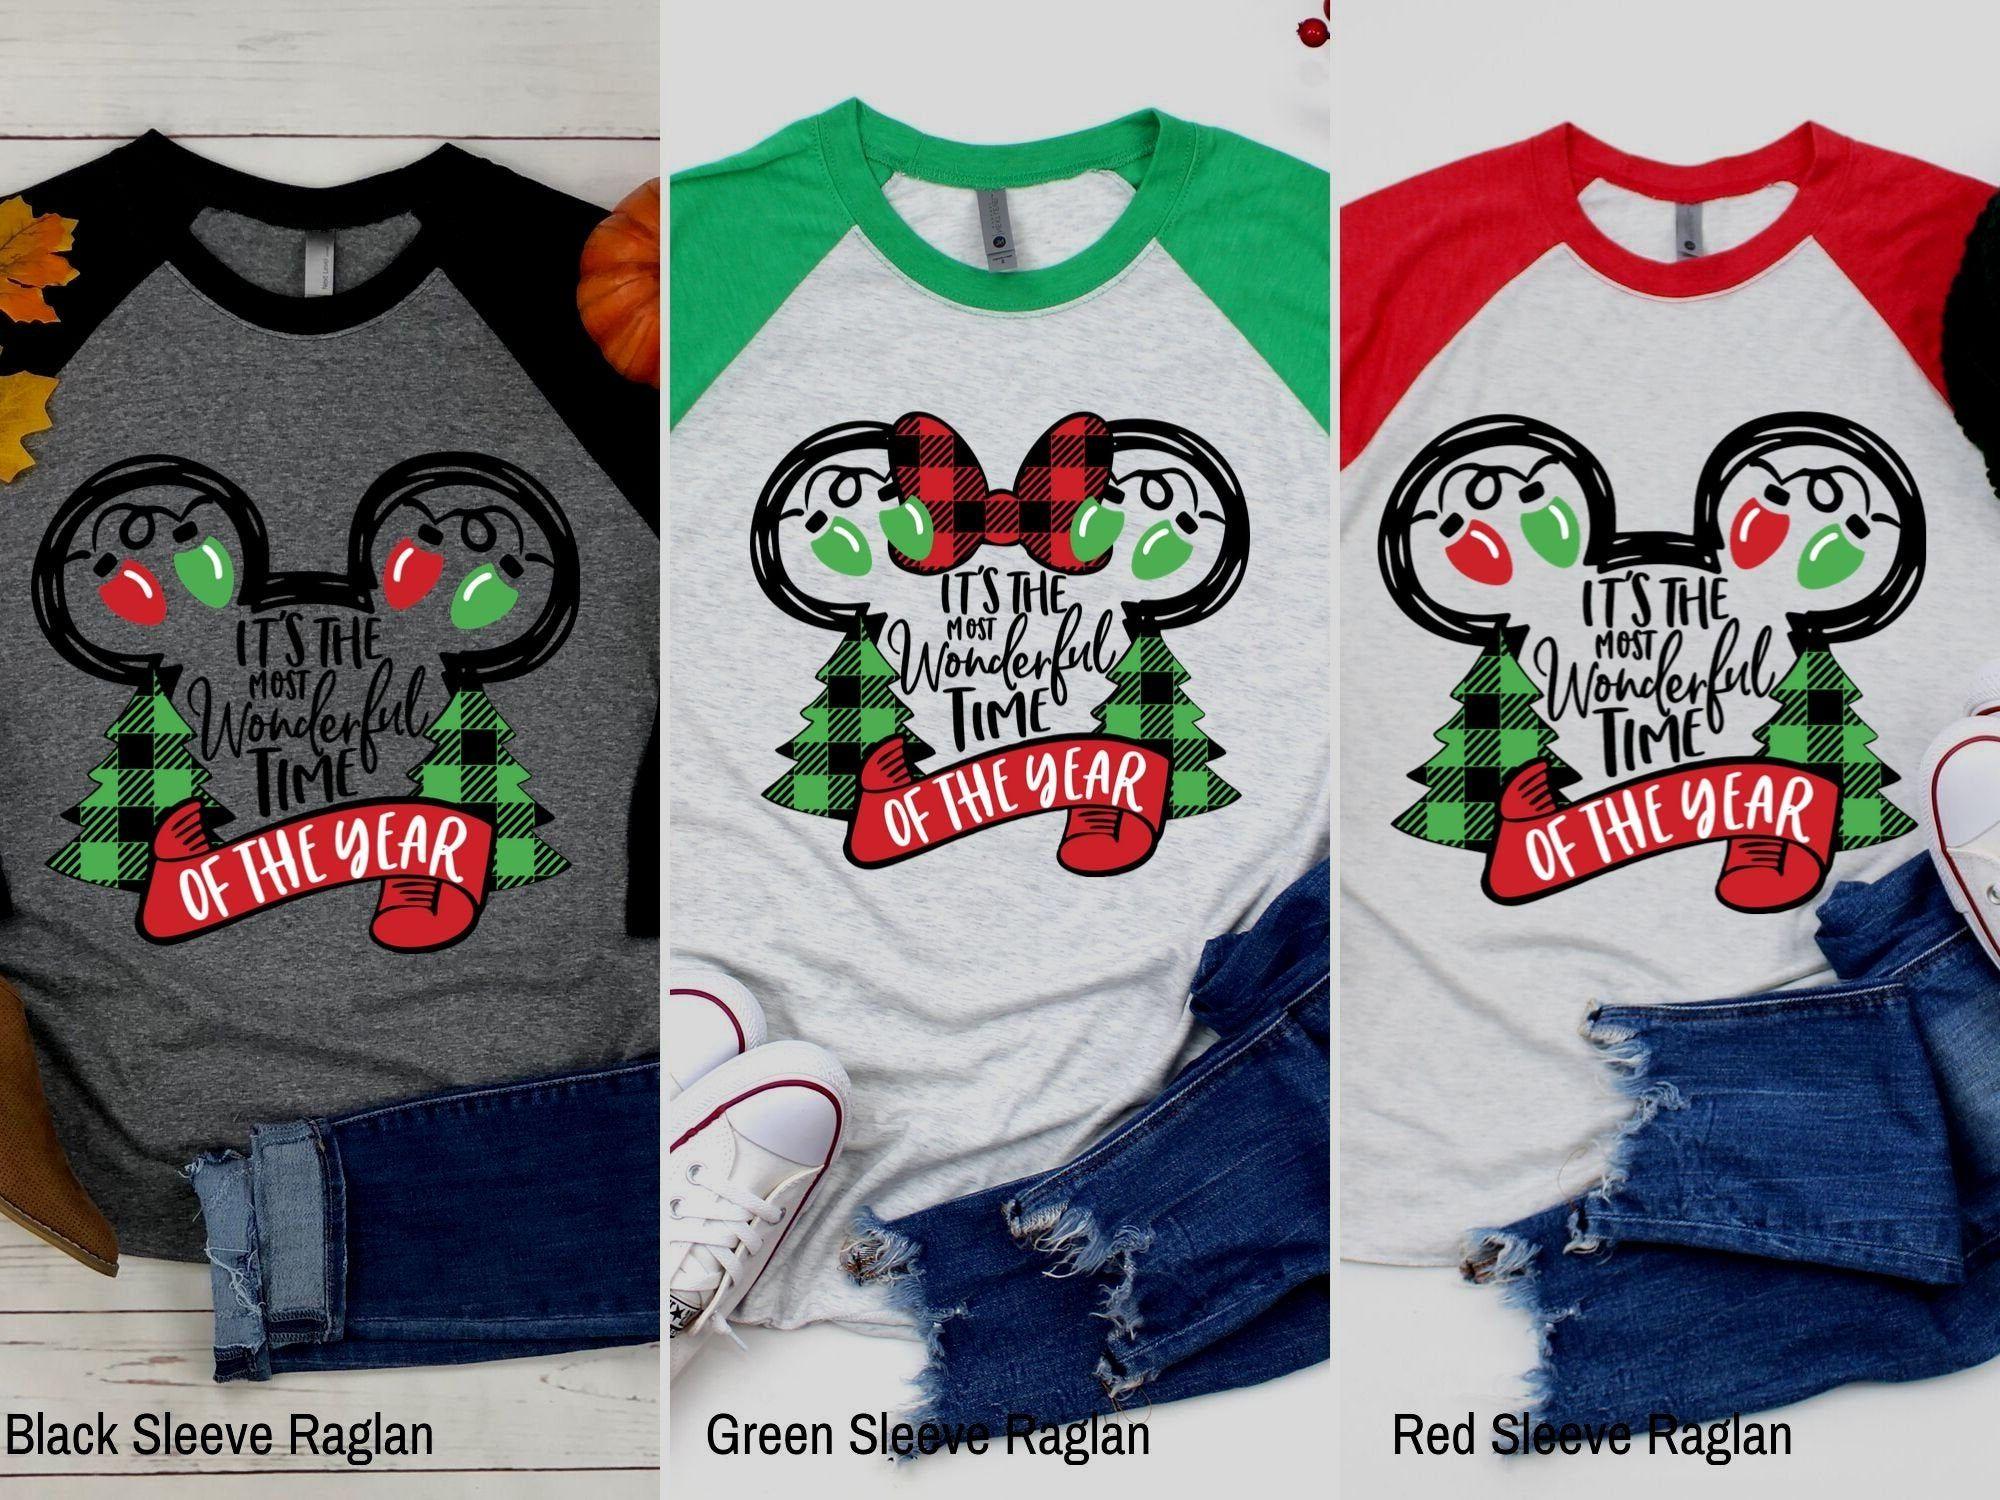 Disney Christmas Shirt Family Disney Shirts Most Wonderful Etsy In 2020 Disney Shirts For Family Disney Christmas Shirts Christmas Shirts